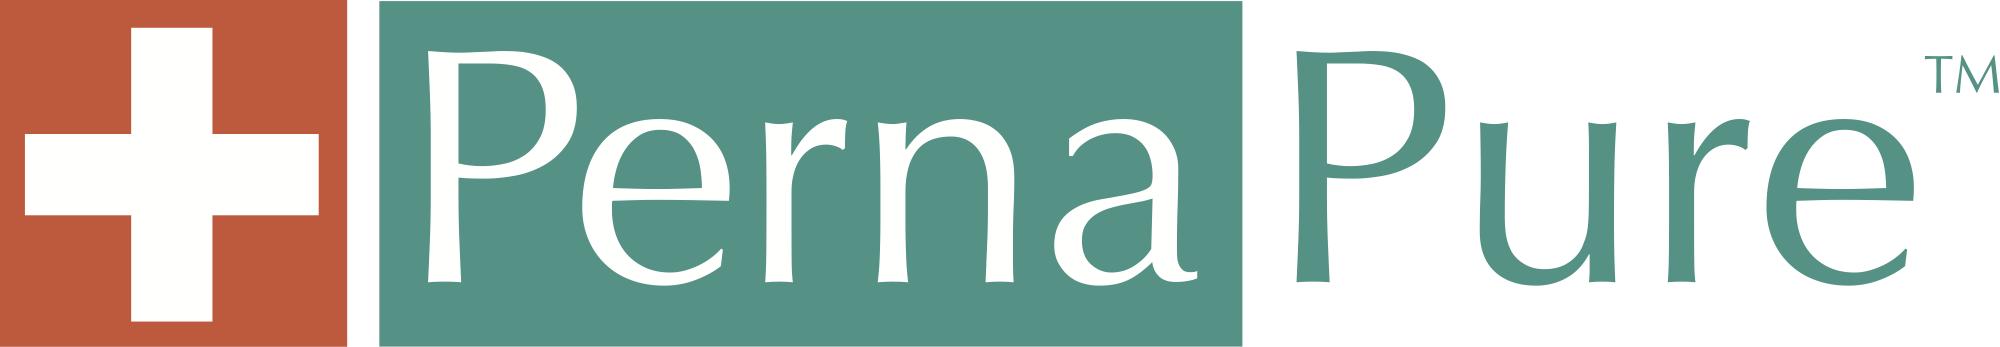 PernaPure Logo_RGB.png